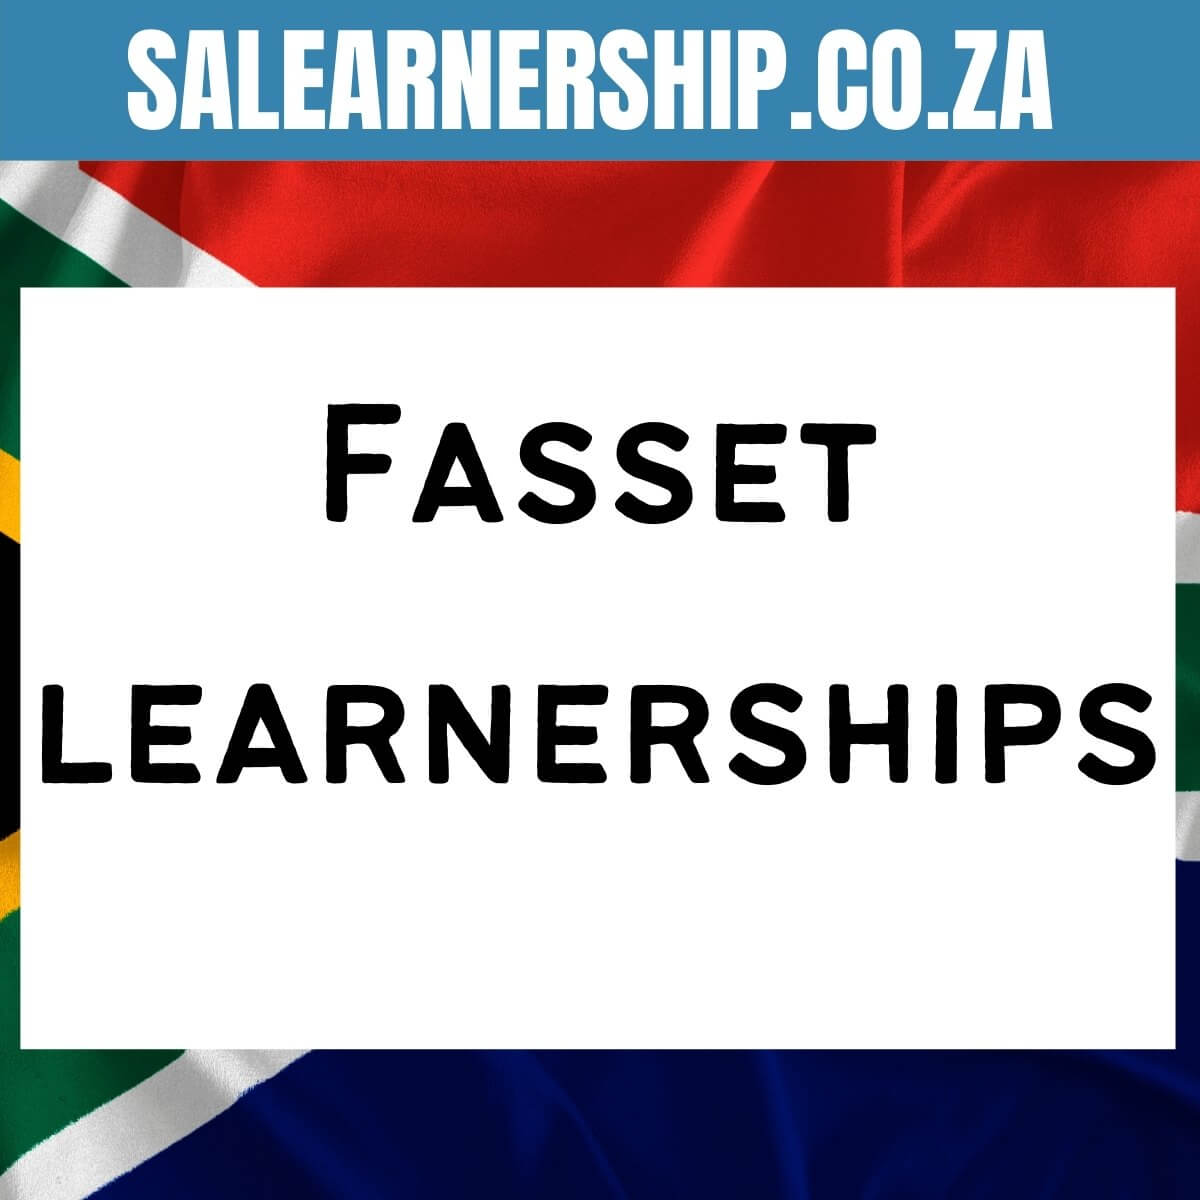 Fasset learnerships